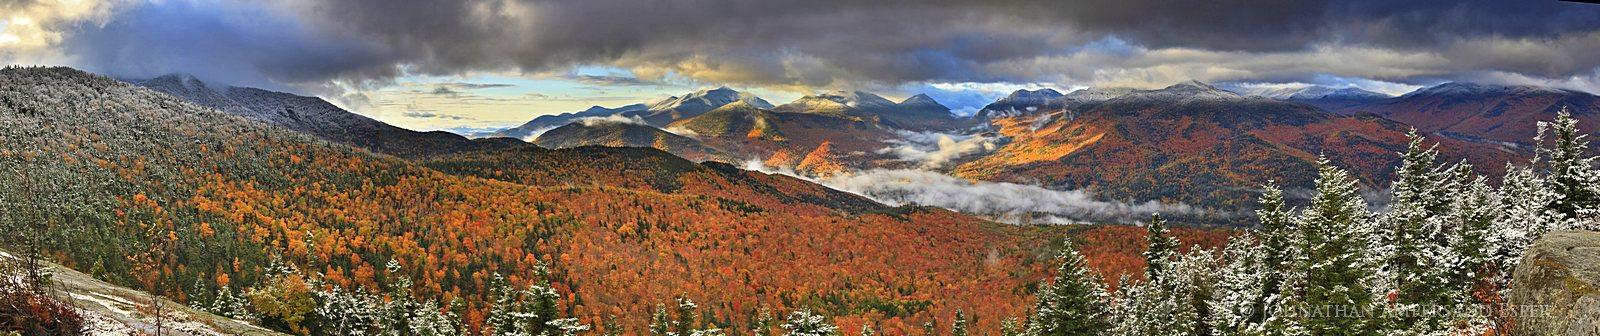 Hopkins Mt,first,autumn,snowfall,autumn snowfall,High Peaks,Hopkins Mountain,Keene Valley,Adirondack Mountains,Giant Mt,, photo